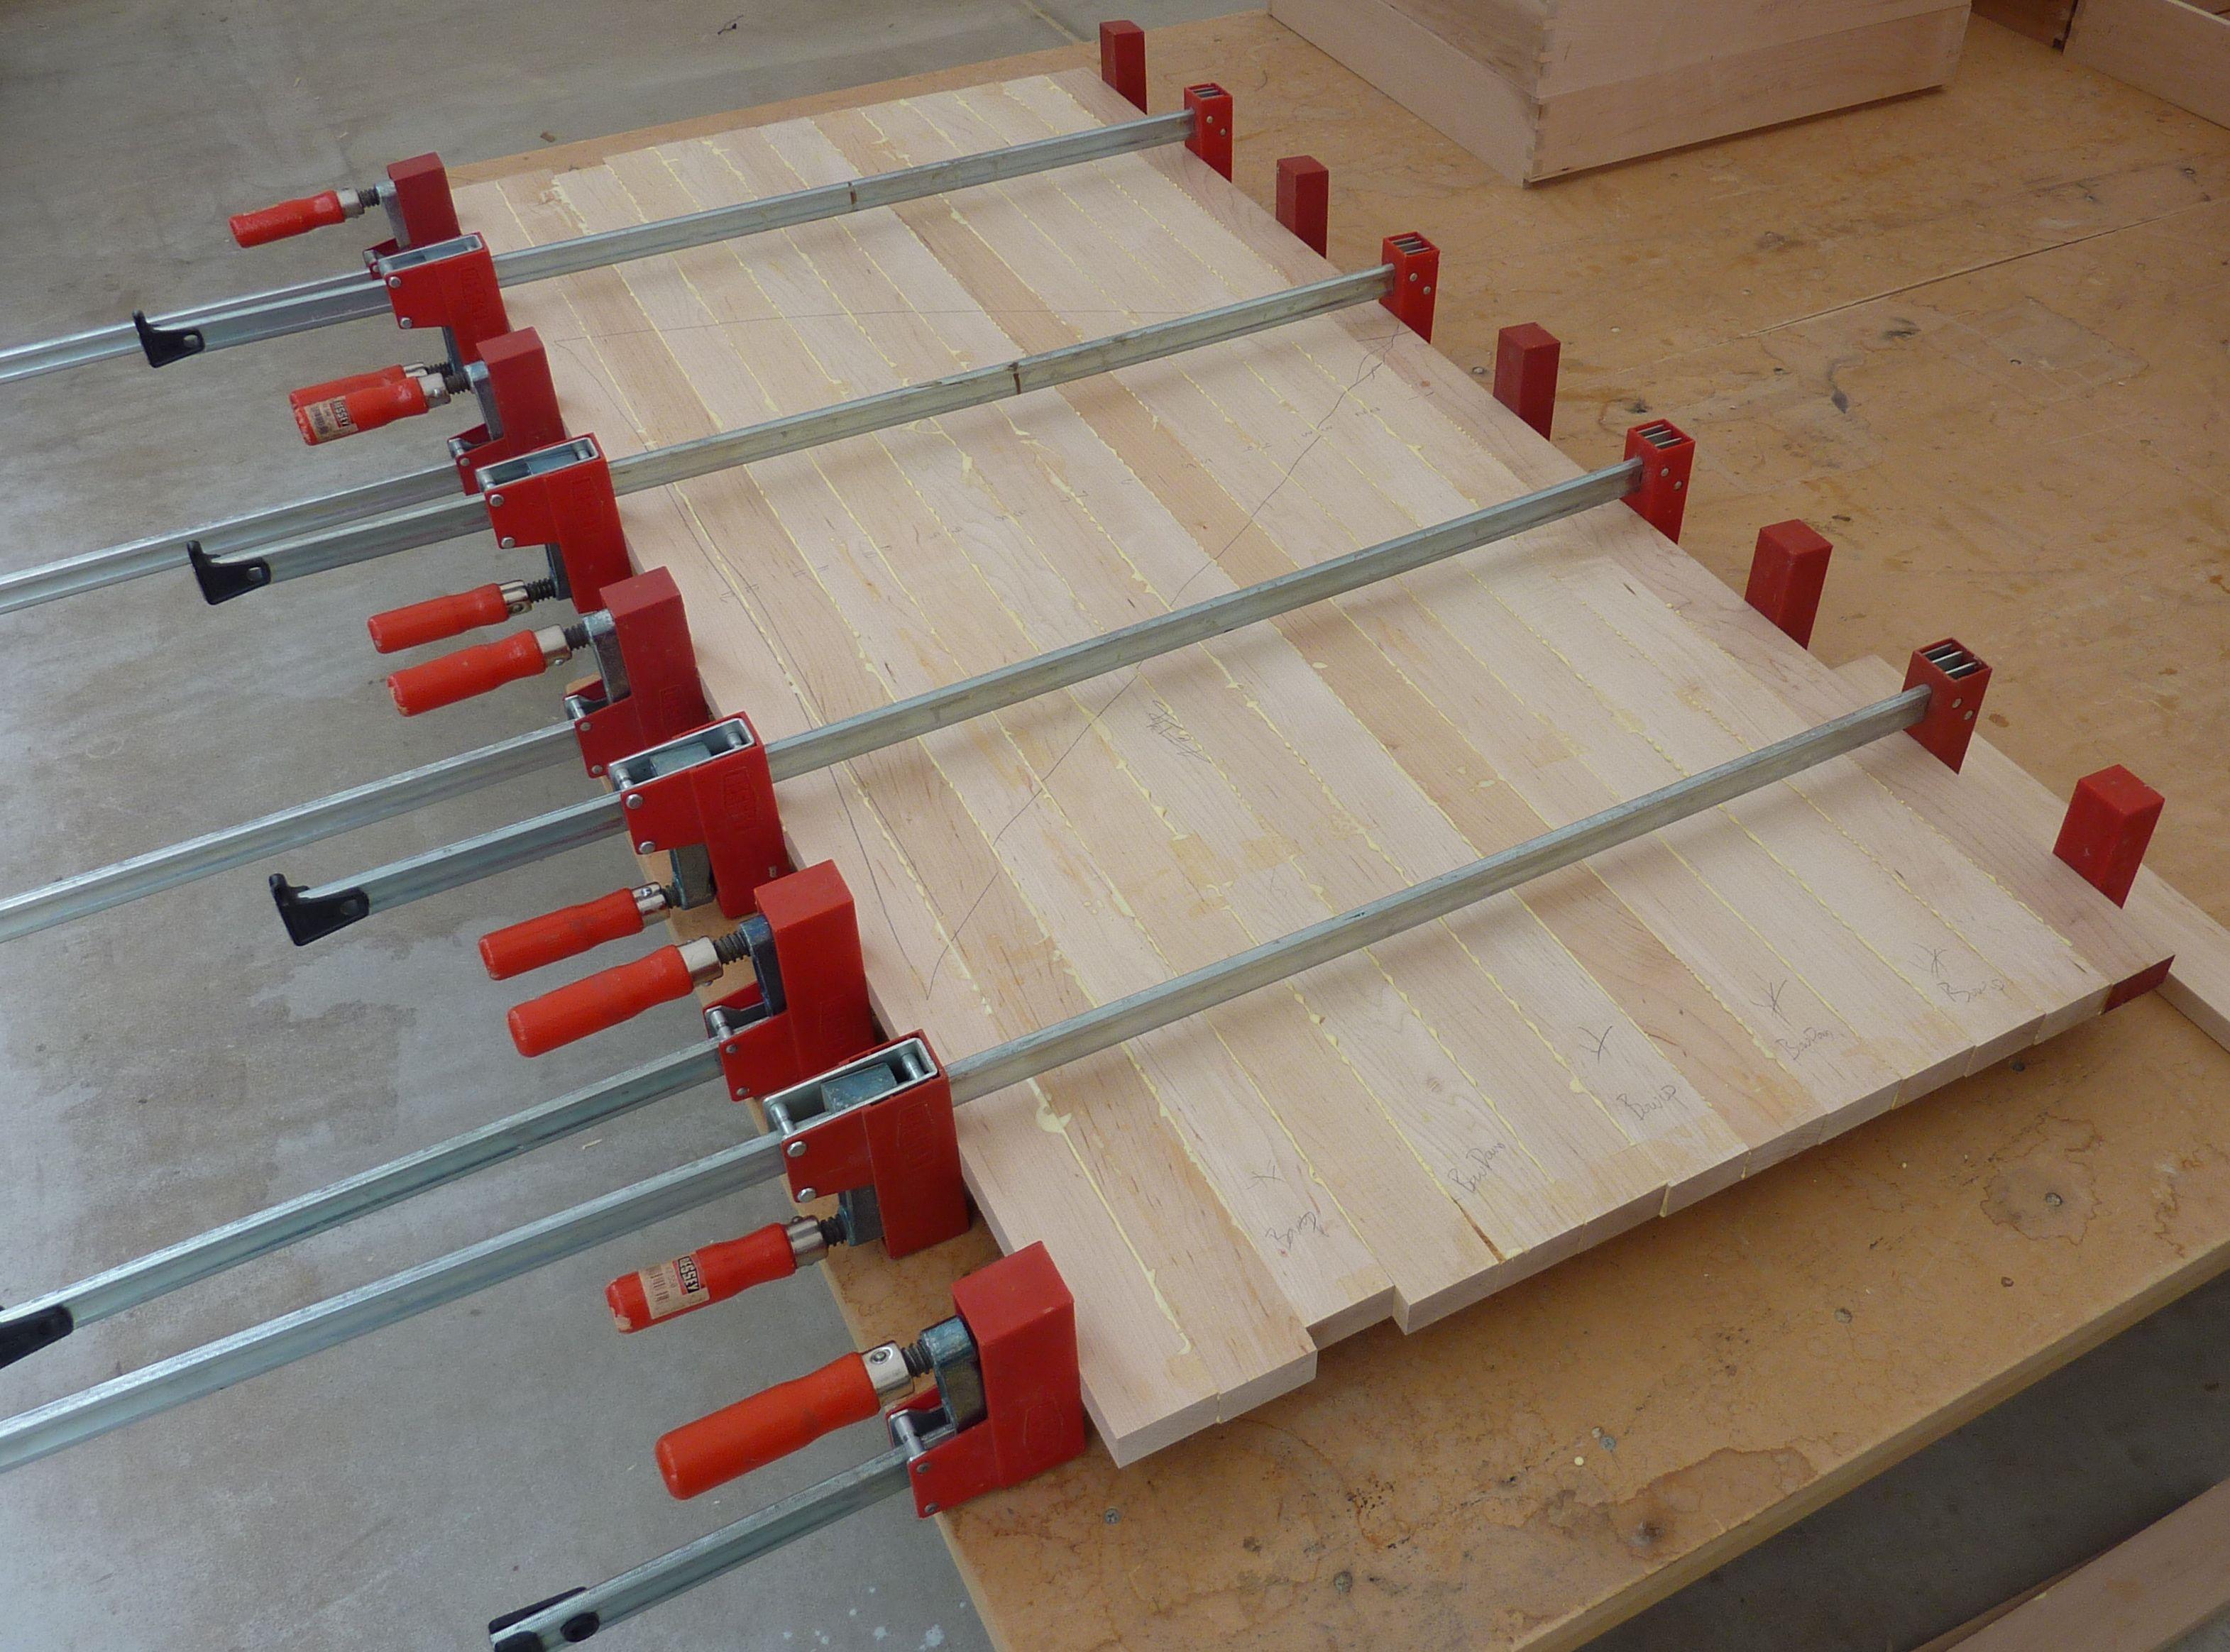 File:Bar clamp 1.jpg - Wikimedia Commons